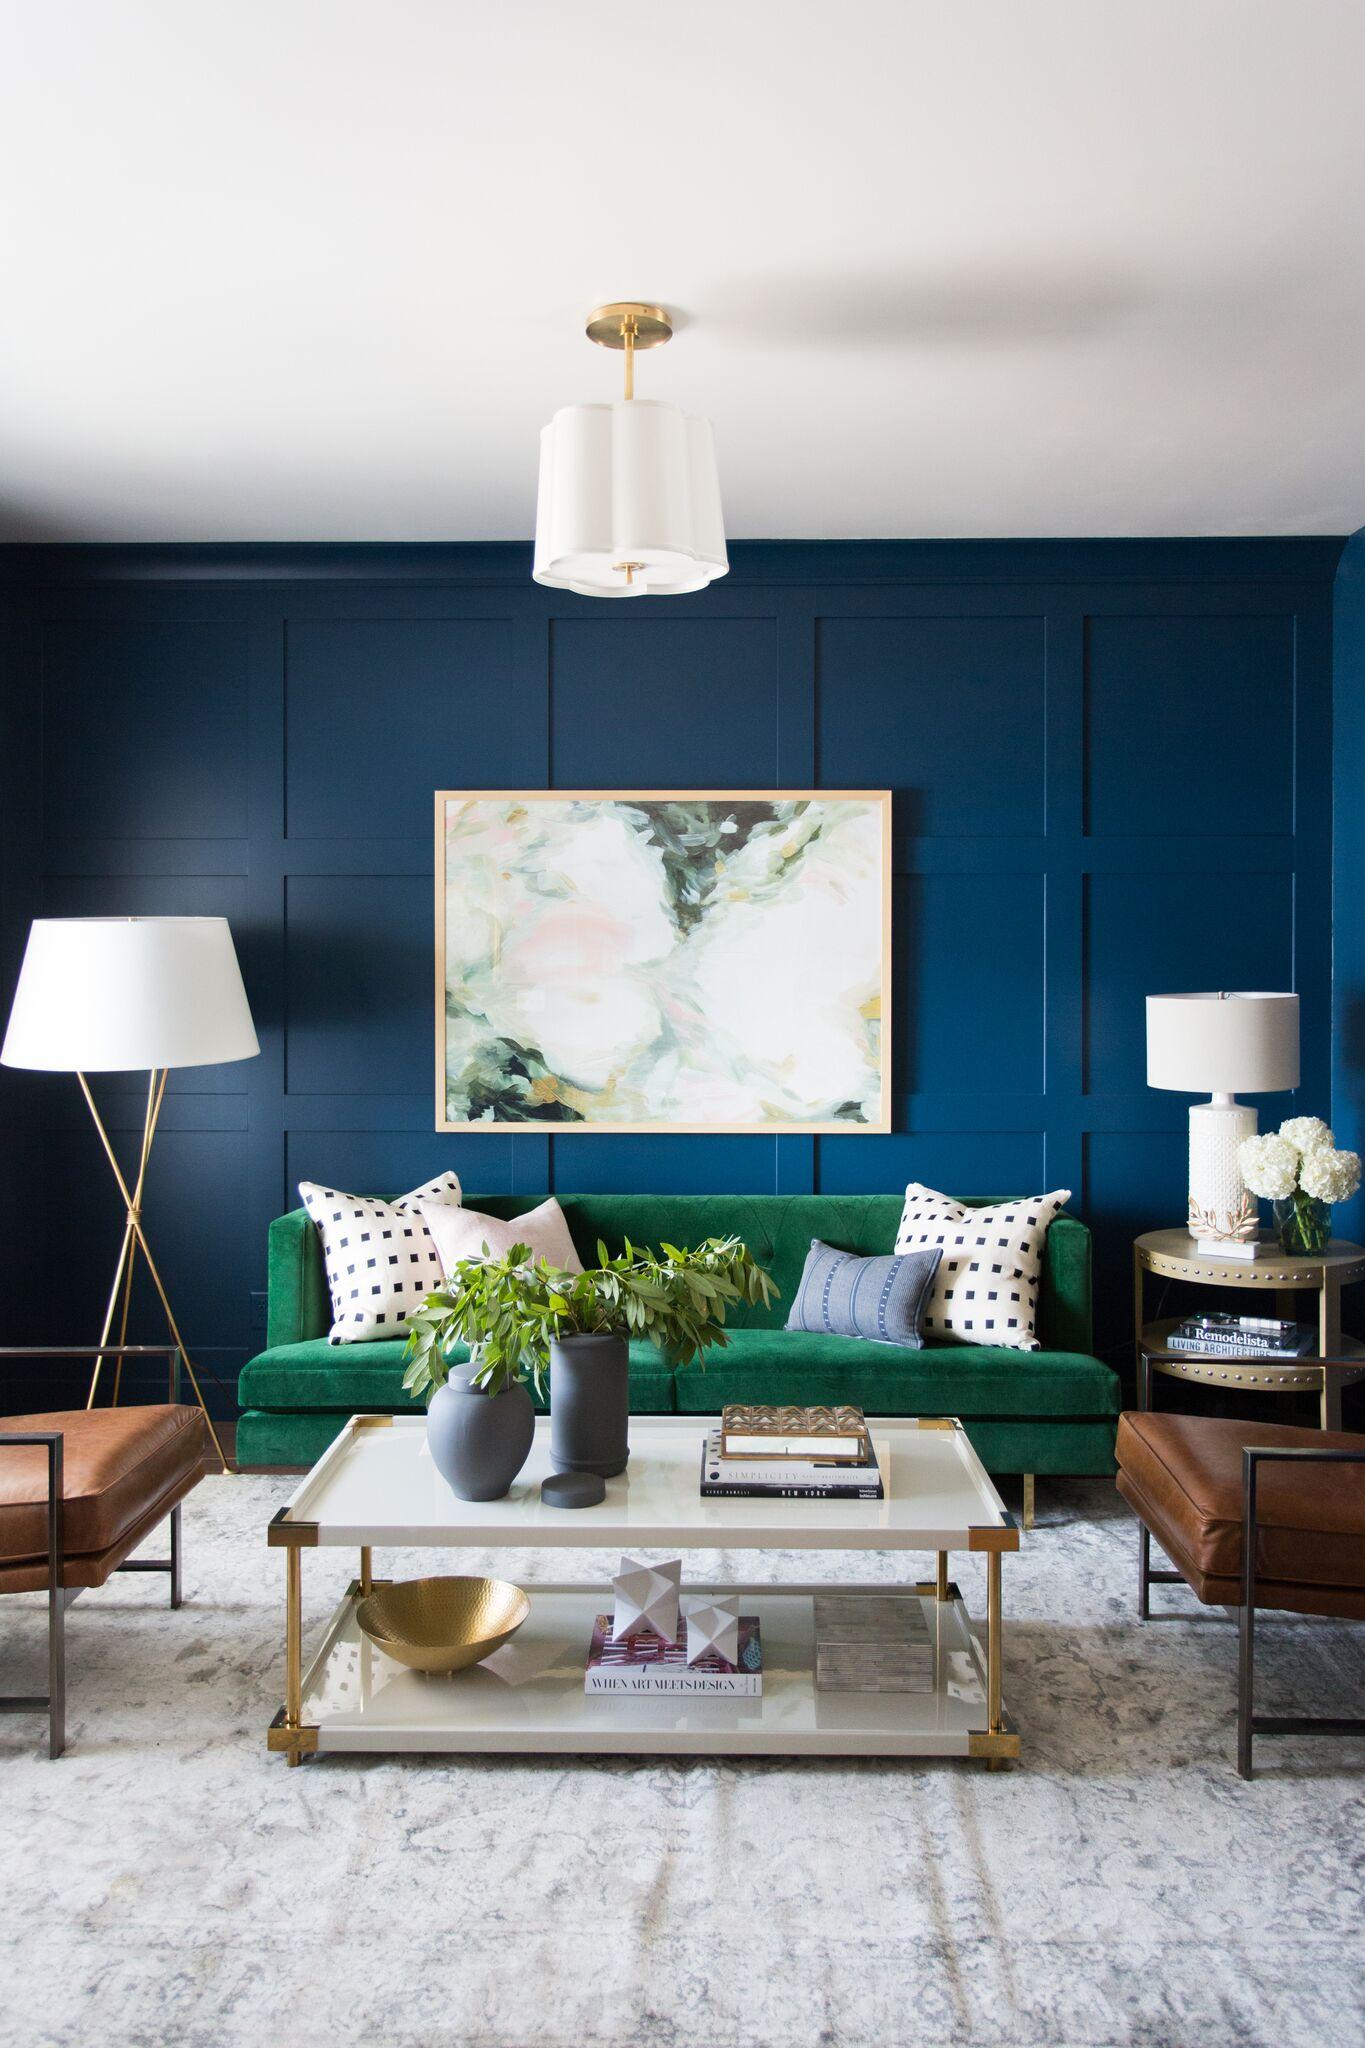 woonkamer leren stoelen velvet bank blauwe muur